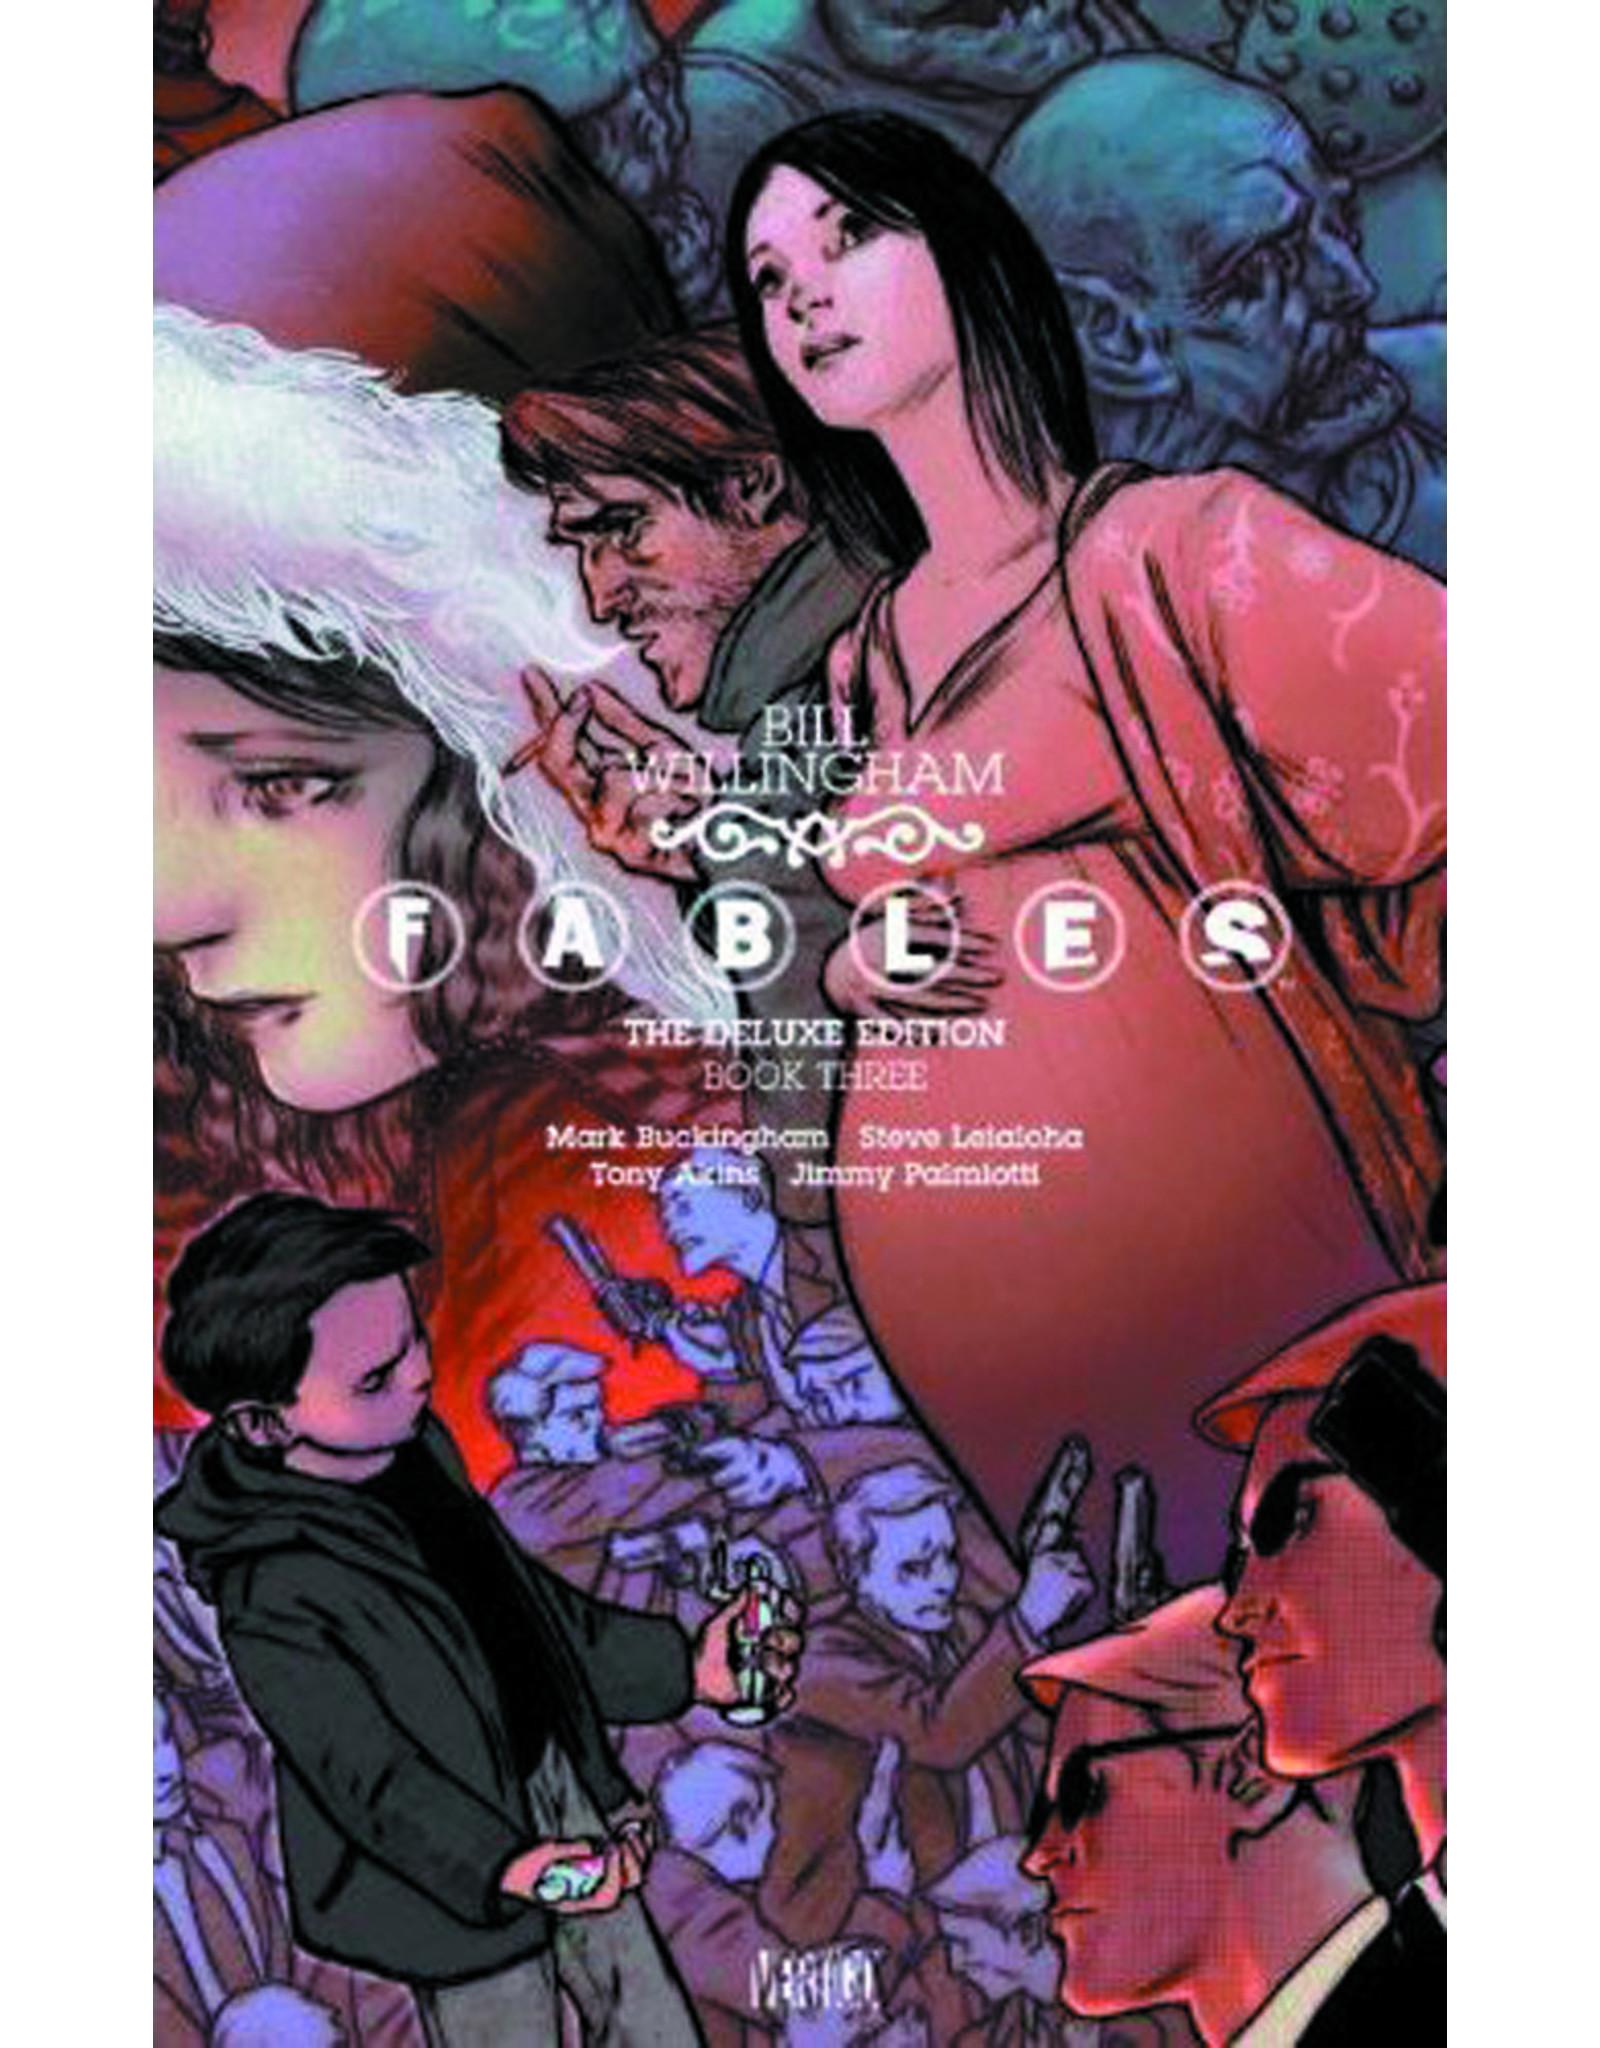 DC COMICS FABLES DELUXE EDITION HC VOL 03